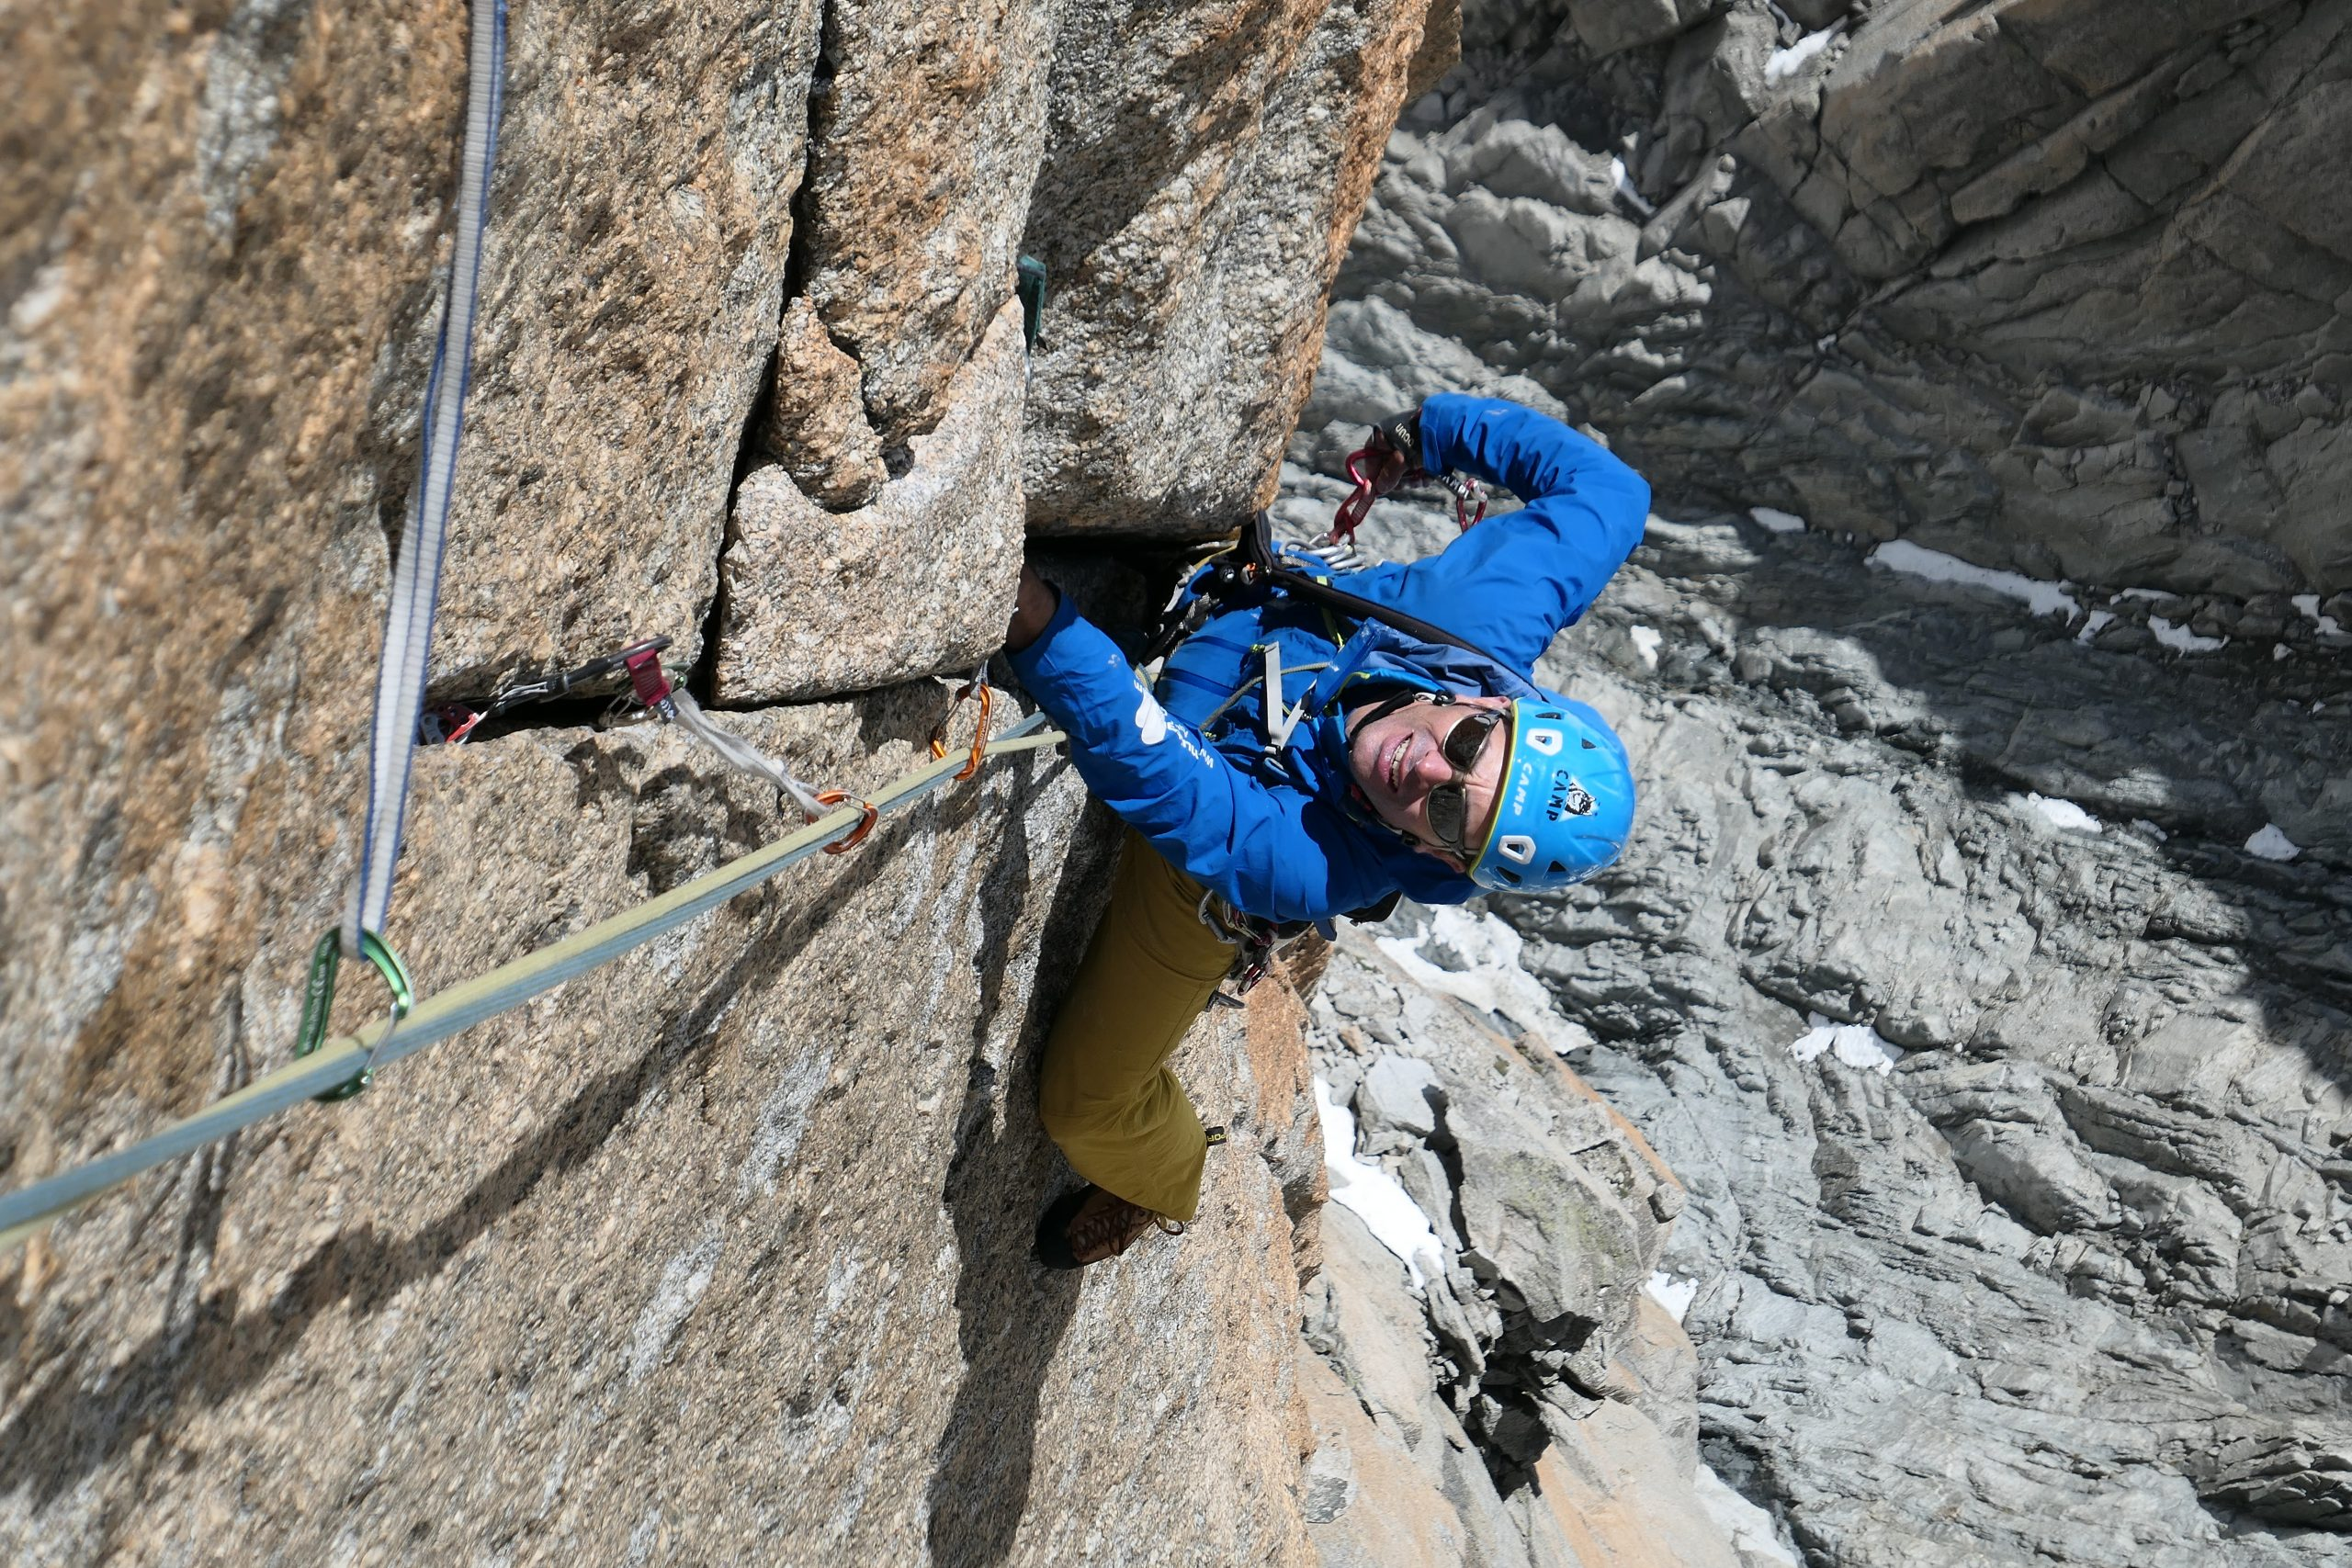 Curso de escalada en roca. Nivel 3 (vías de varios largos desequipadas). Madrid